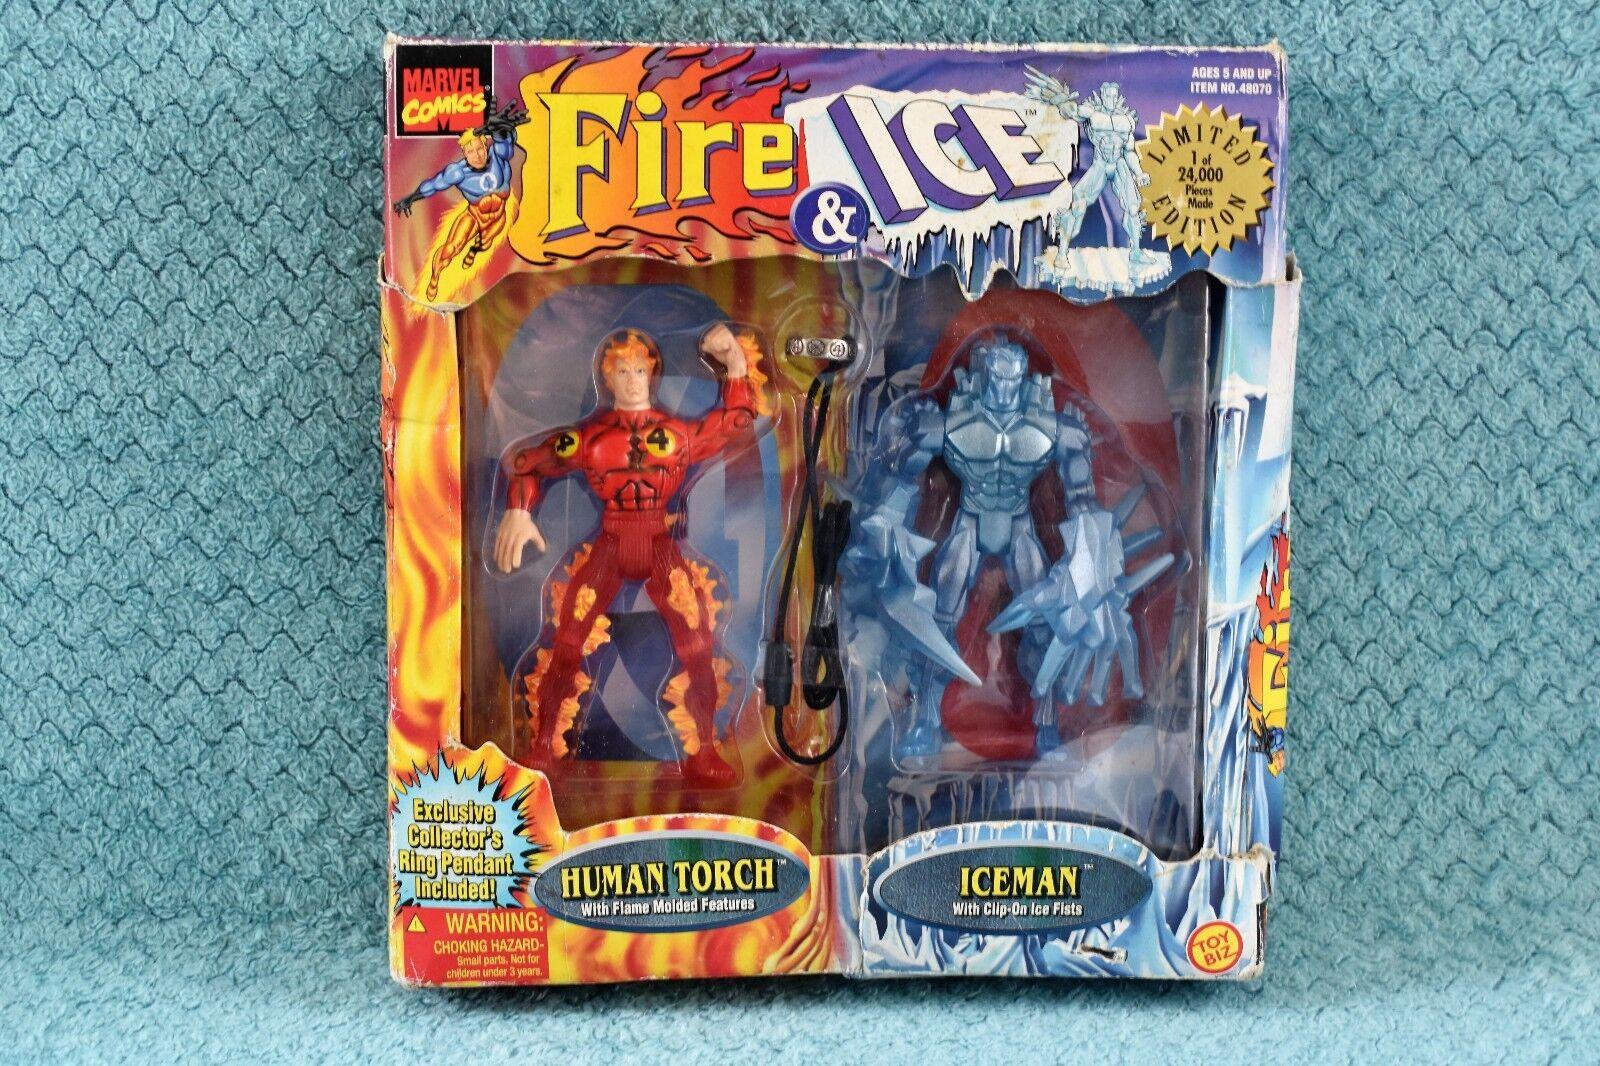 Limited Edition Toybiz Marvel Comics Fire & Ice - Human Torch & Iceman Figures